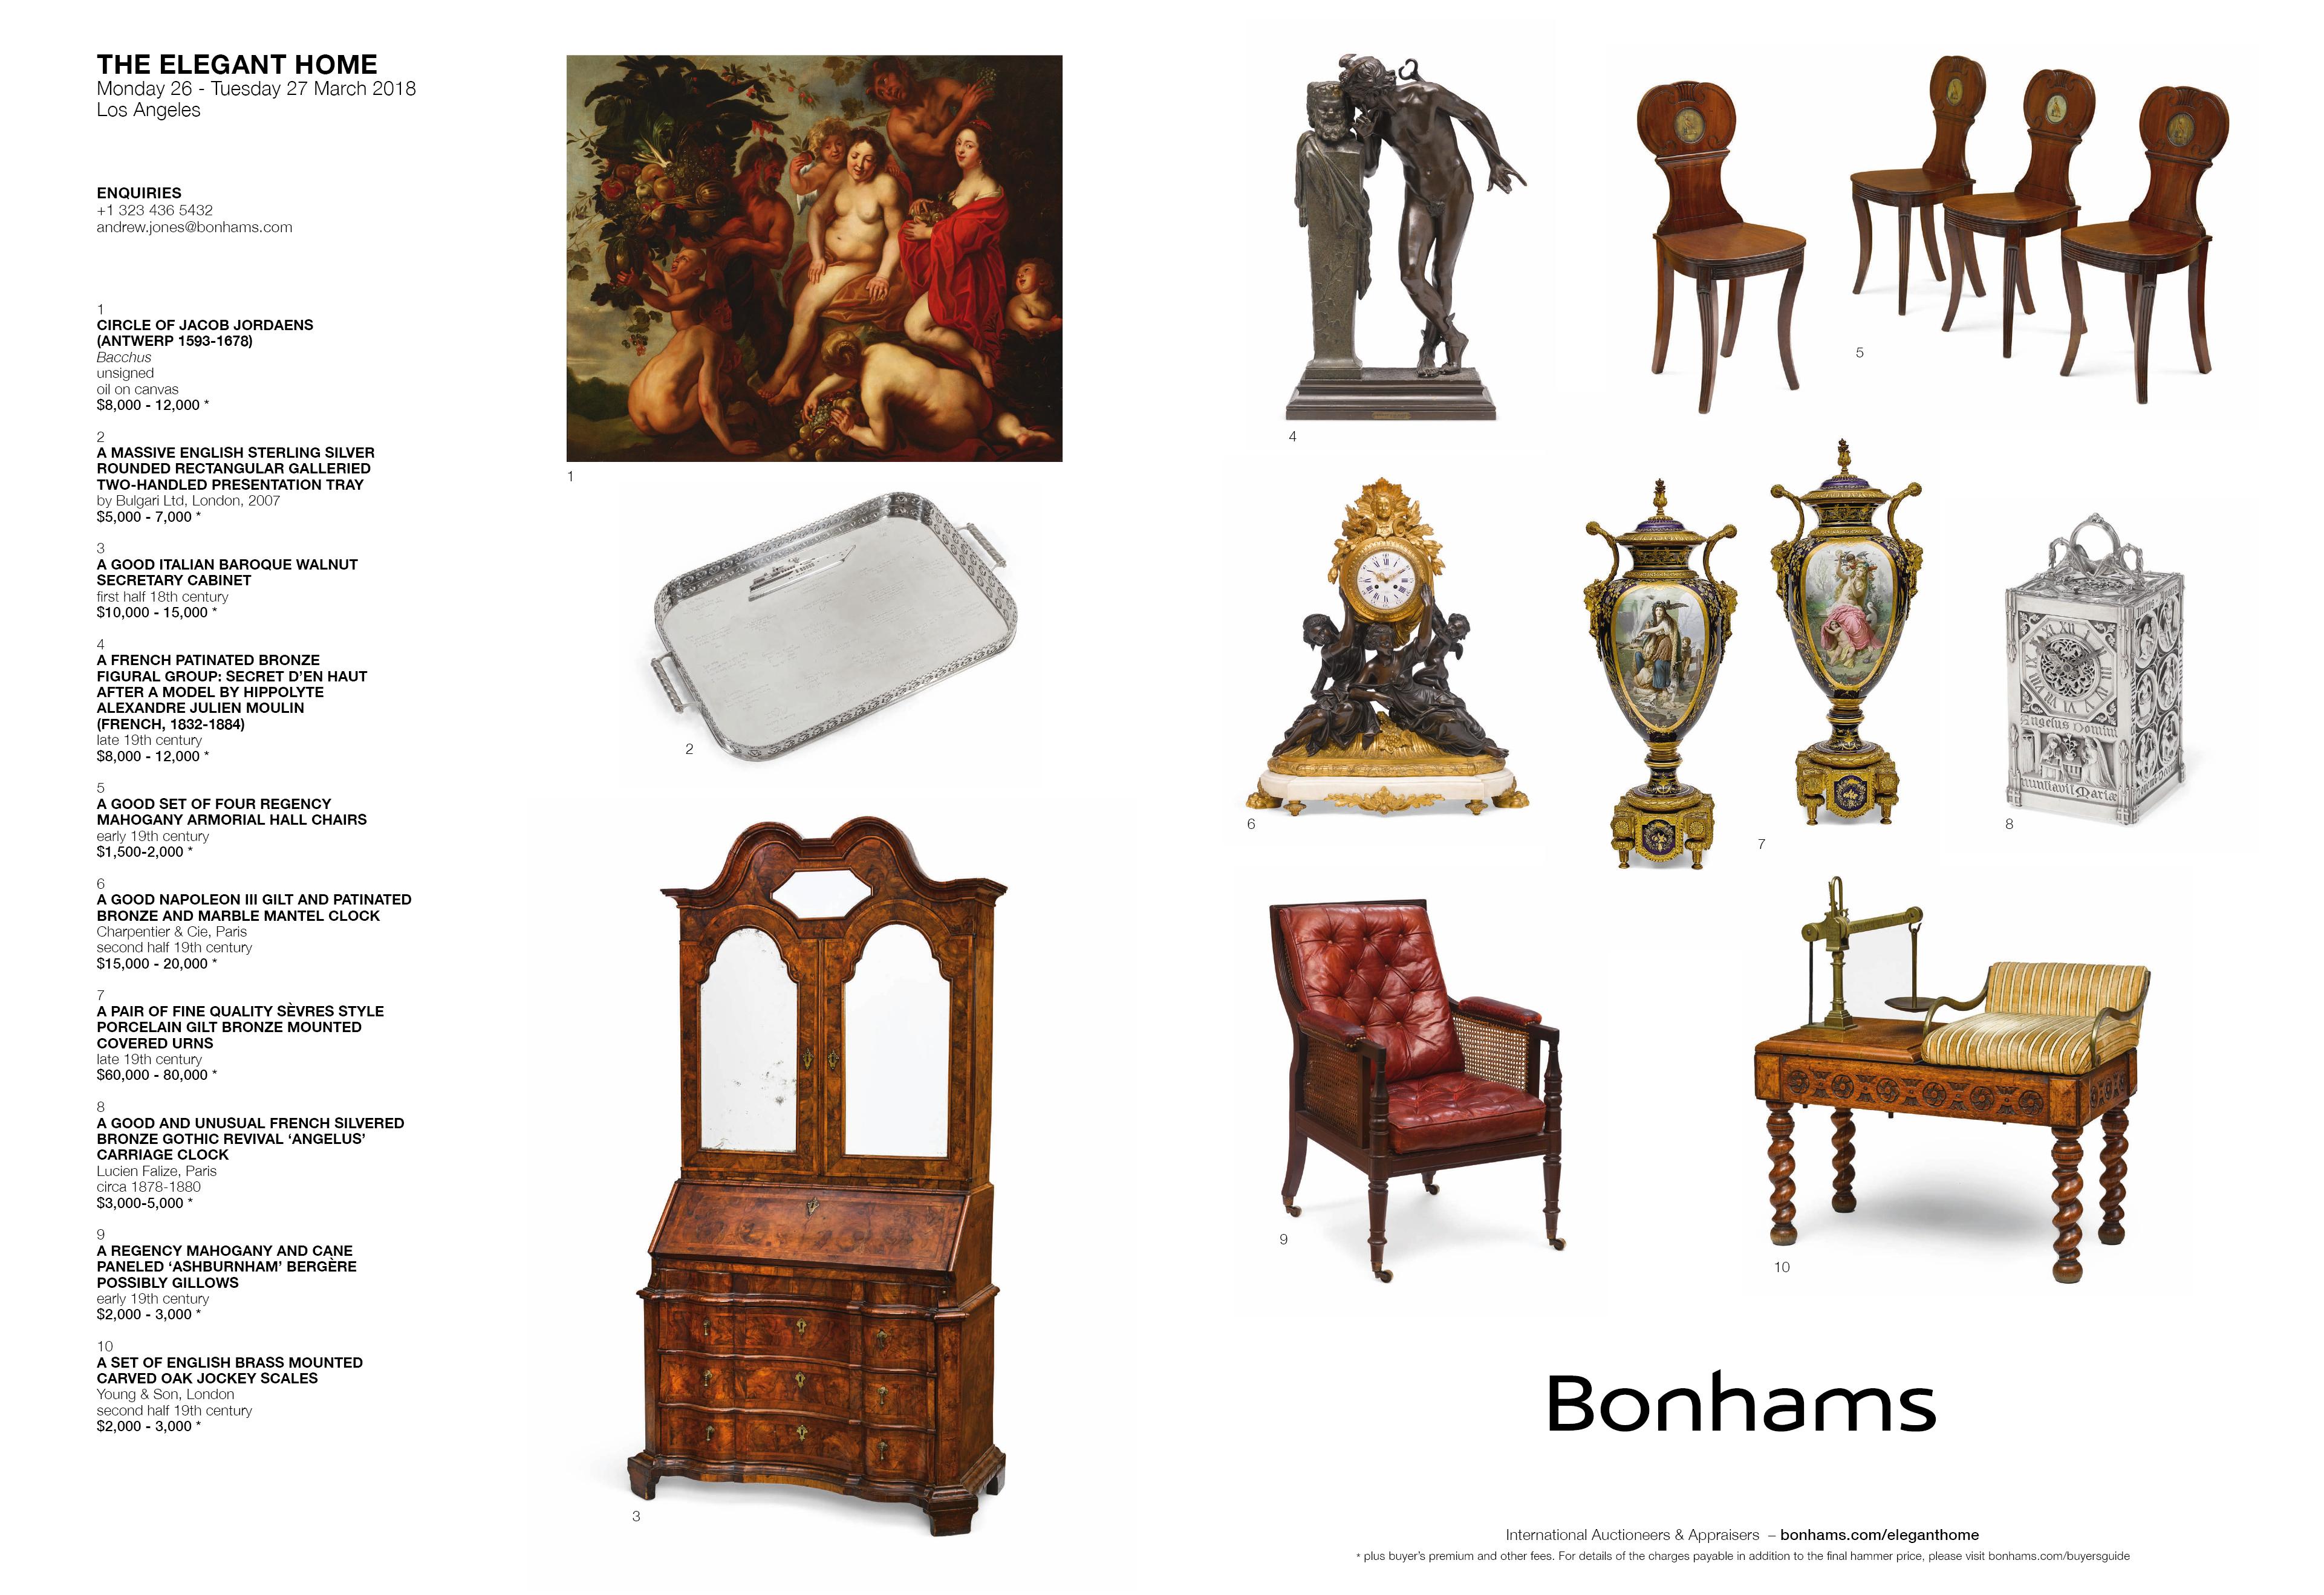 BONHAMS - THE ELEGANT HOME.jpg